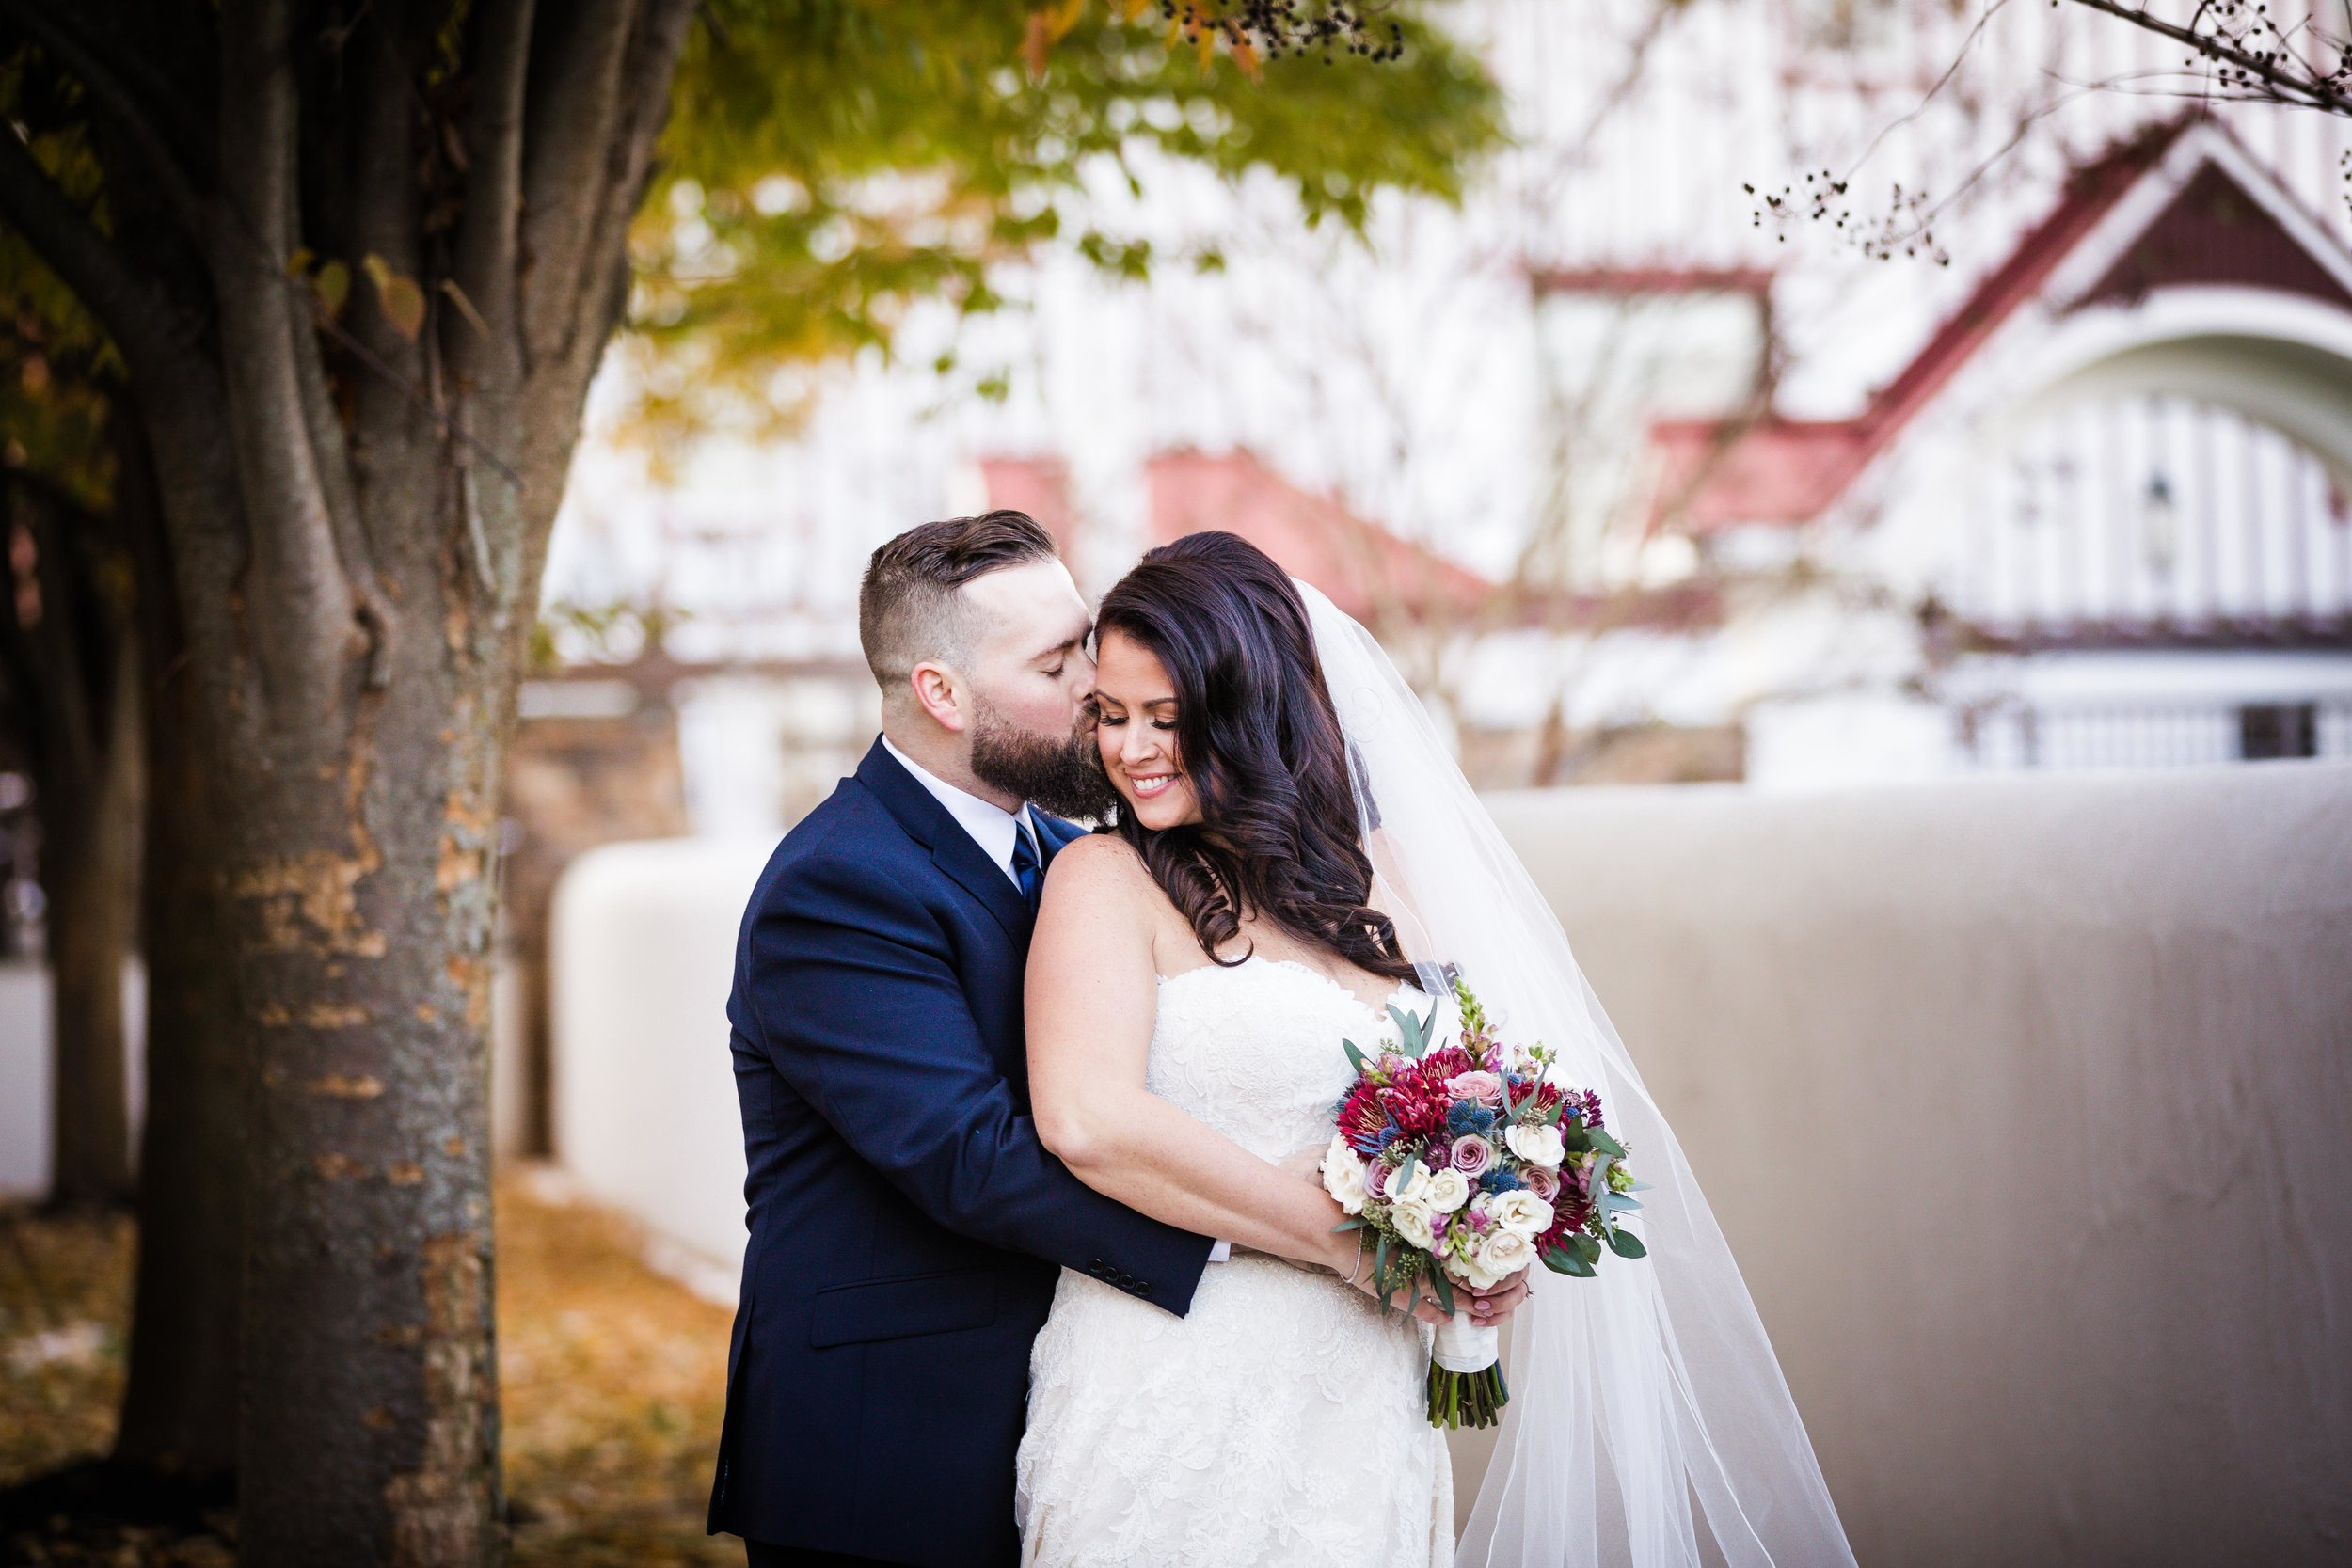 Diana and Henry - Normandy Farms Wedding Photography - Estras-73.jpg